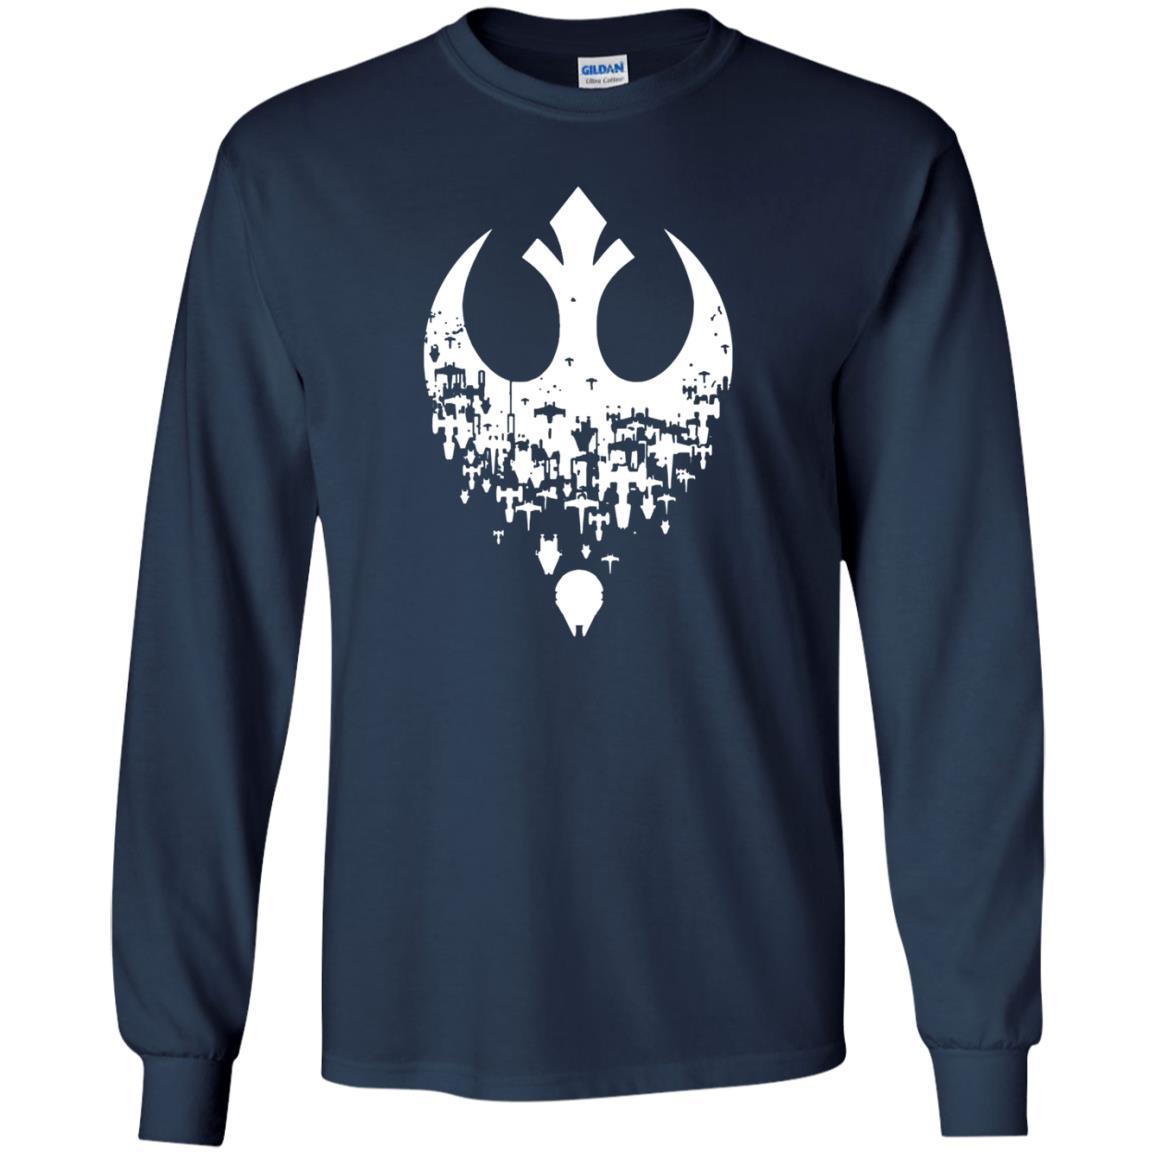 image 1502 - Star Wars Fractured Rebellion shirt, hoodie, tank